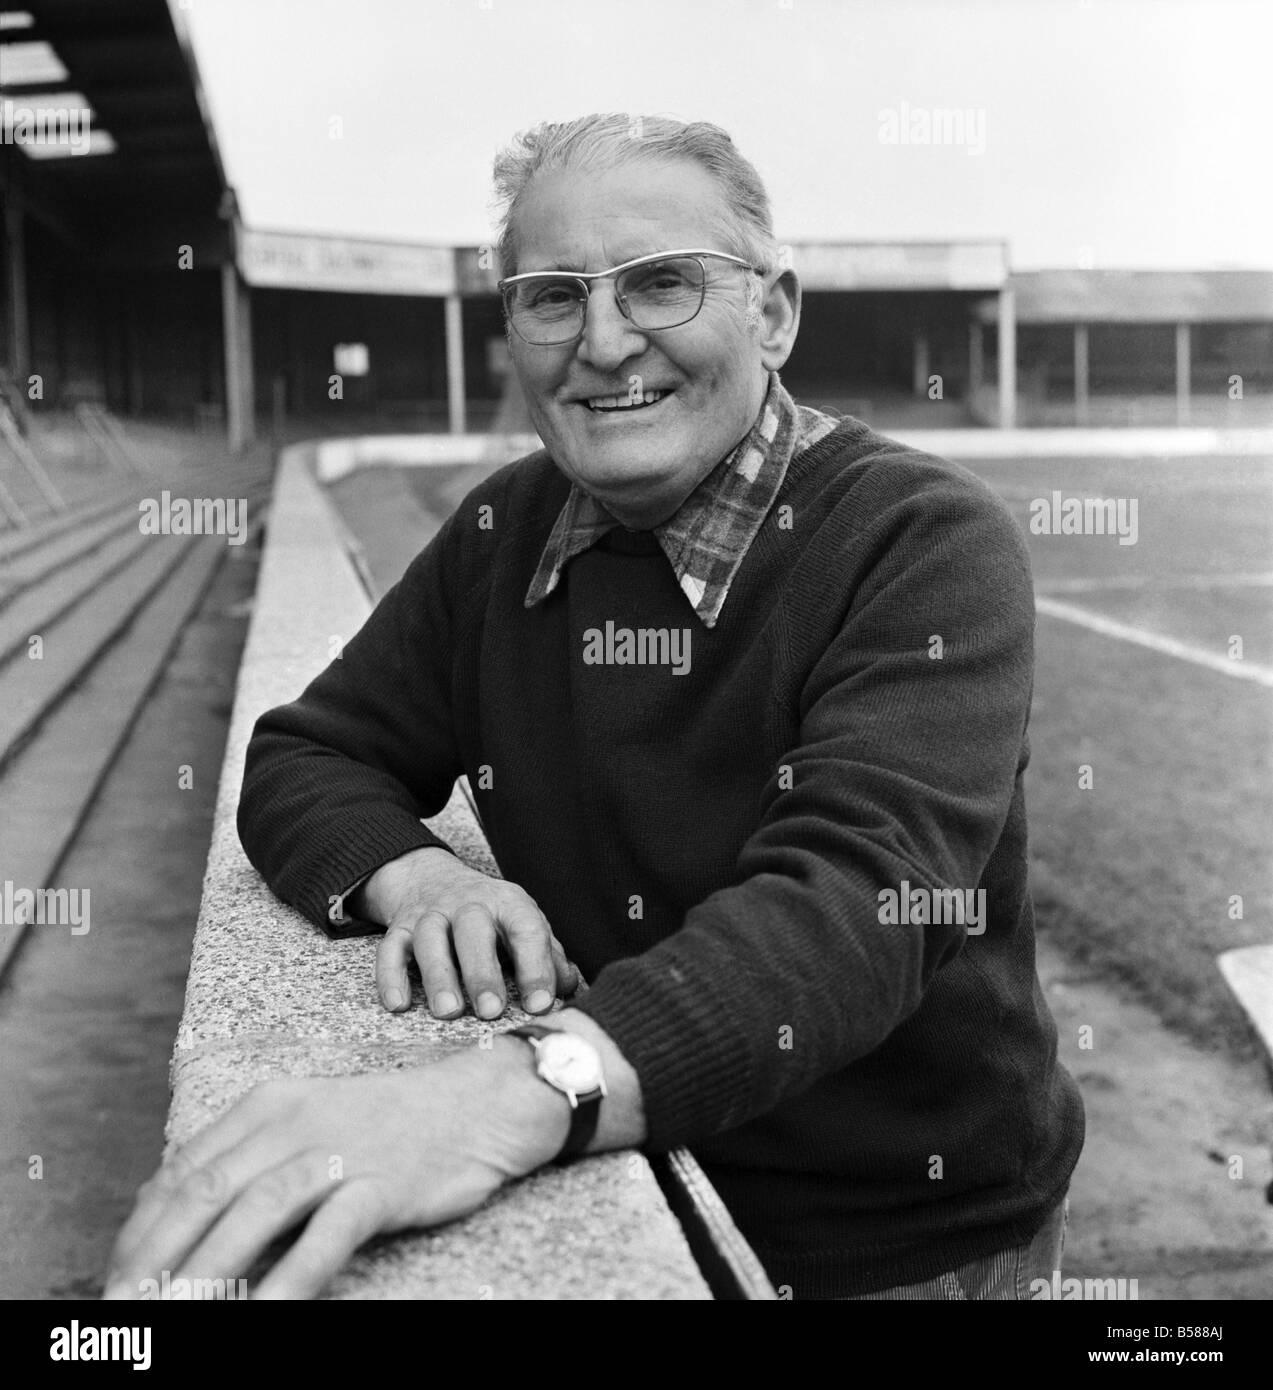 Old man/Grounds man/Humour. January 1975 75-00466-001 - Stock Image